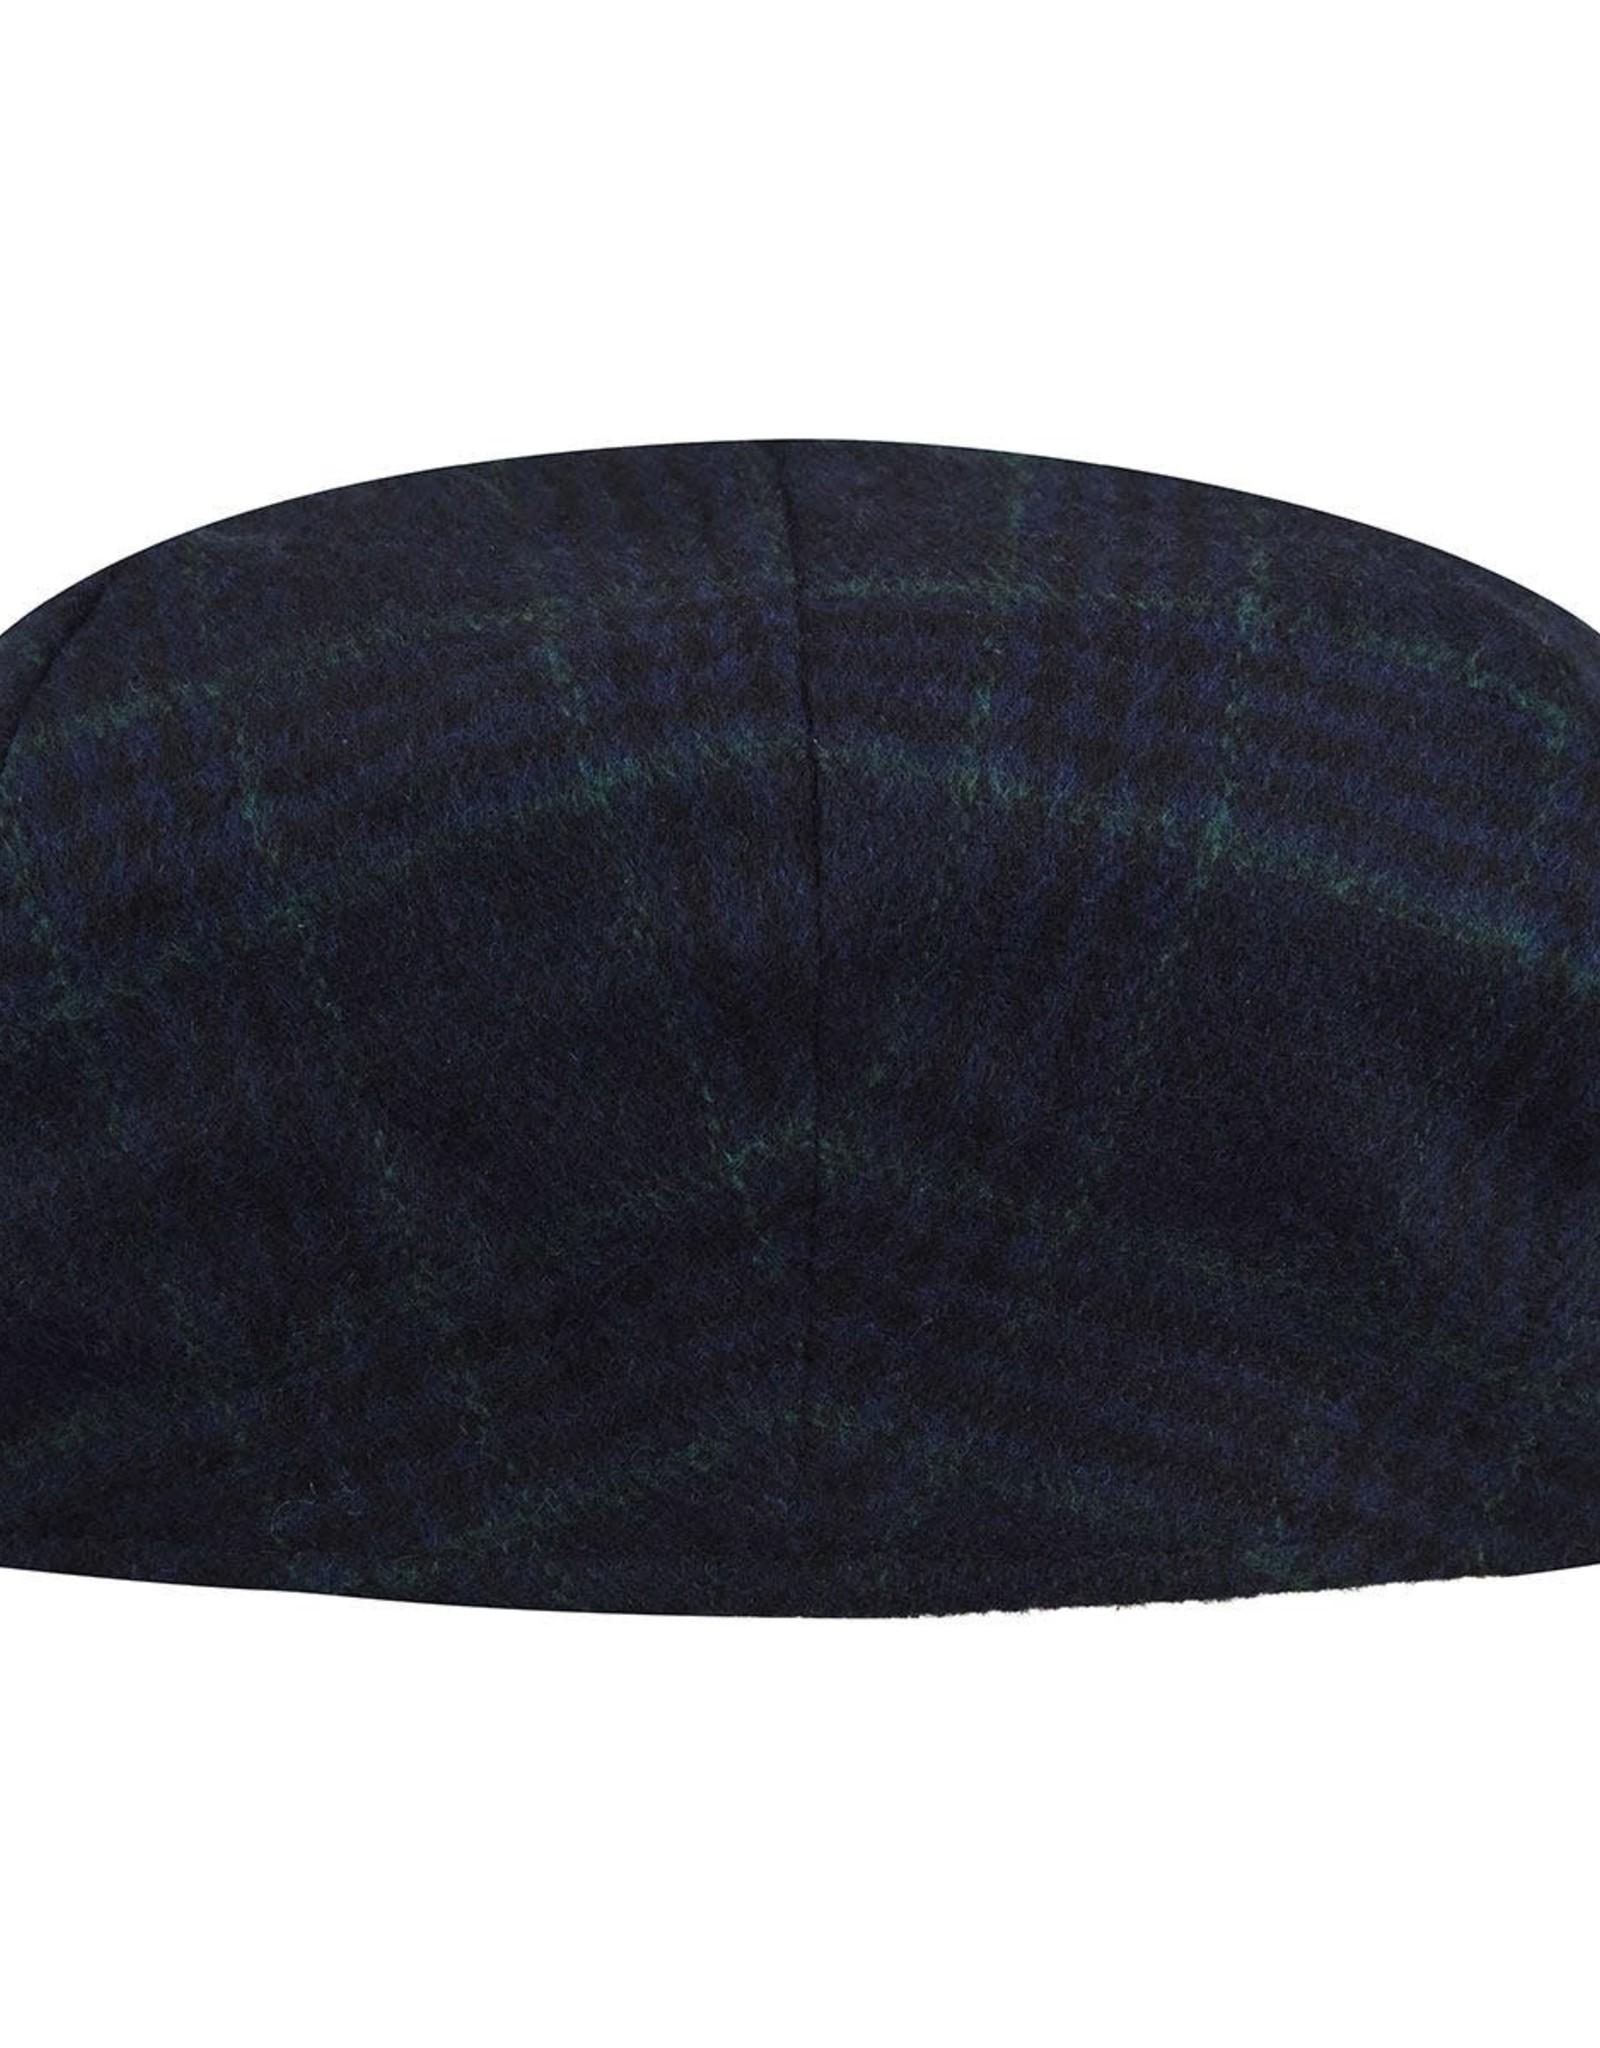 Country Gentleman Wool Blend British Ivy Cap